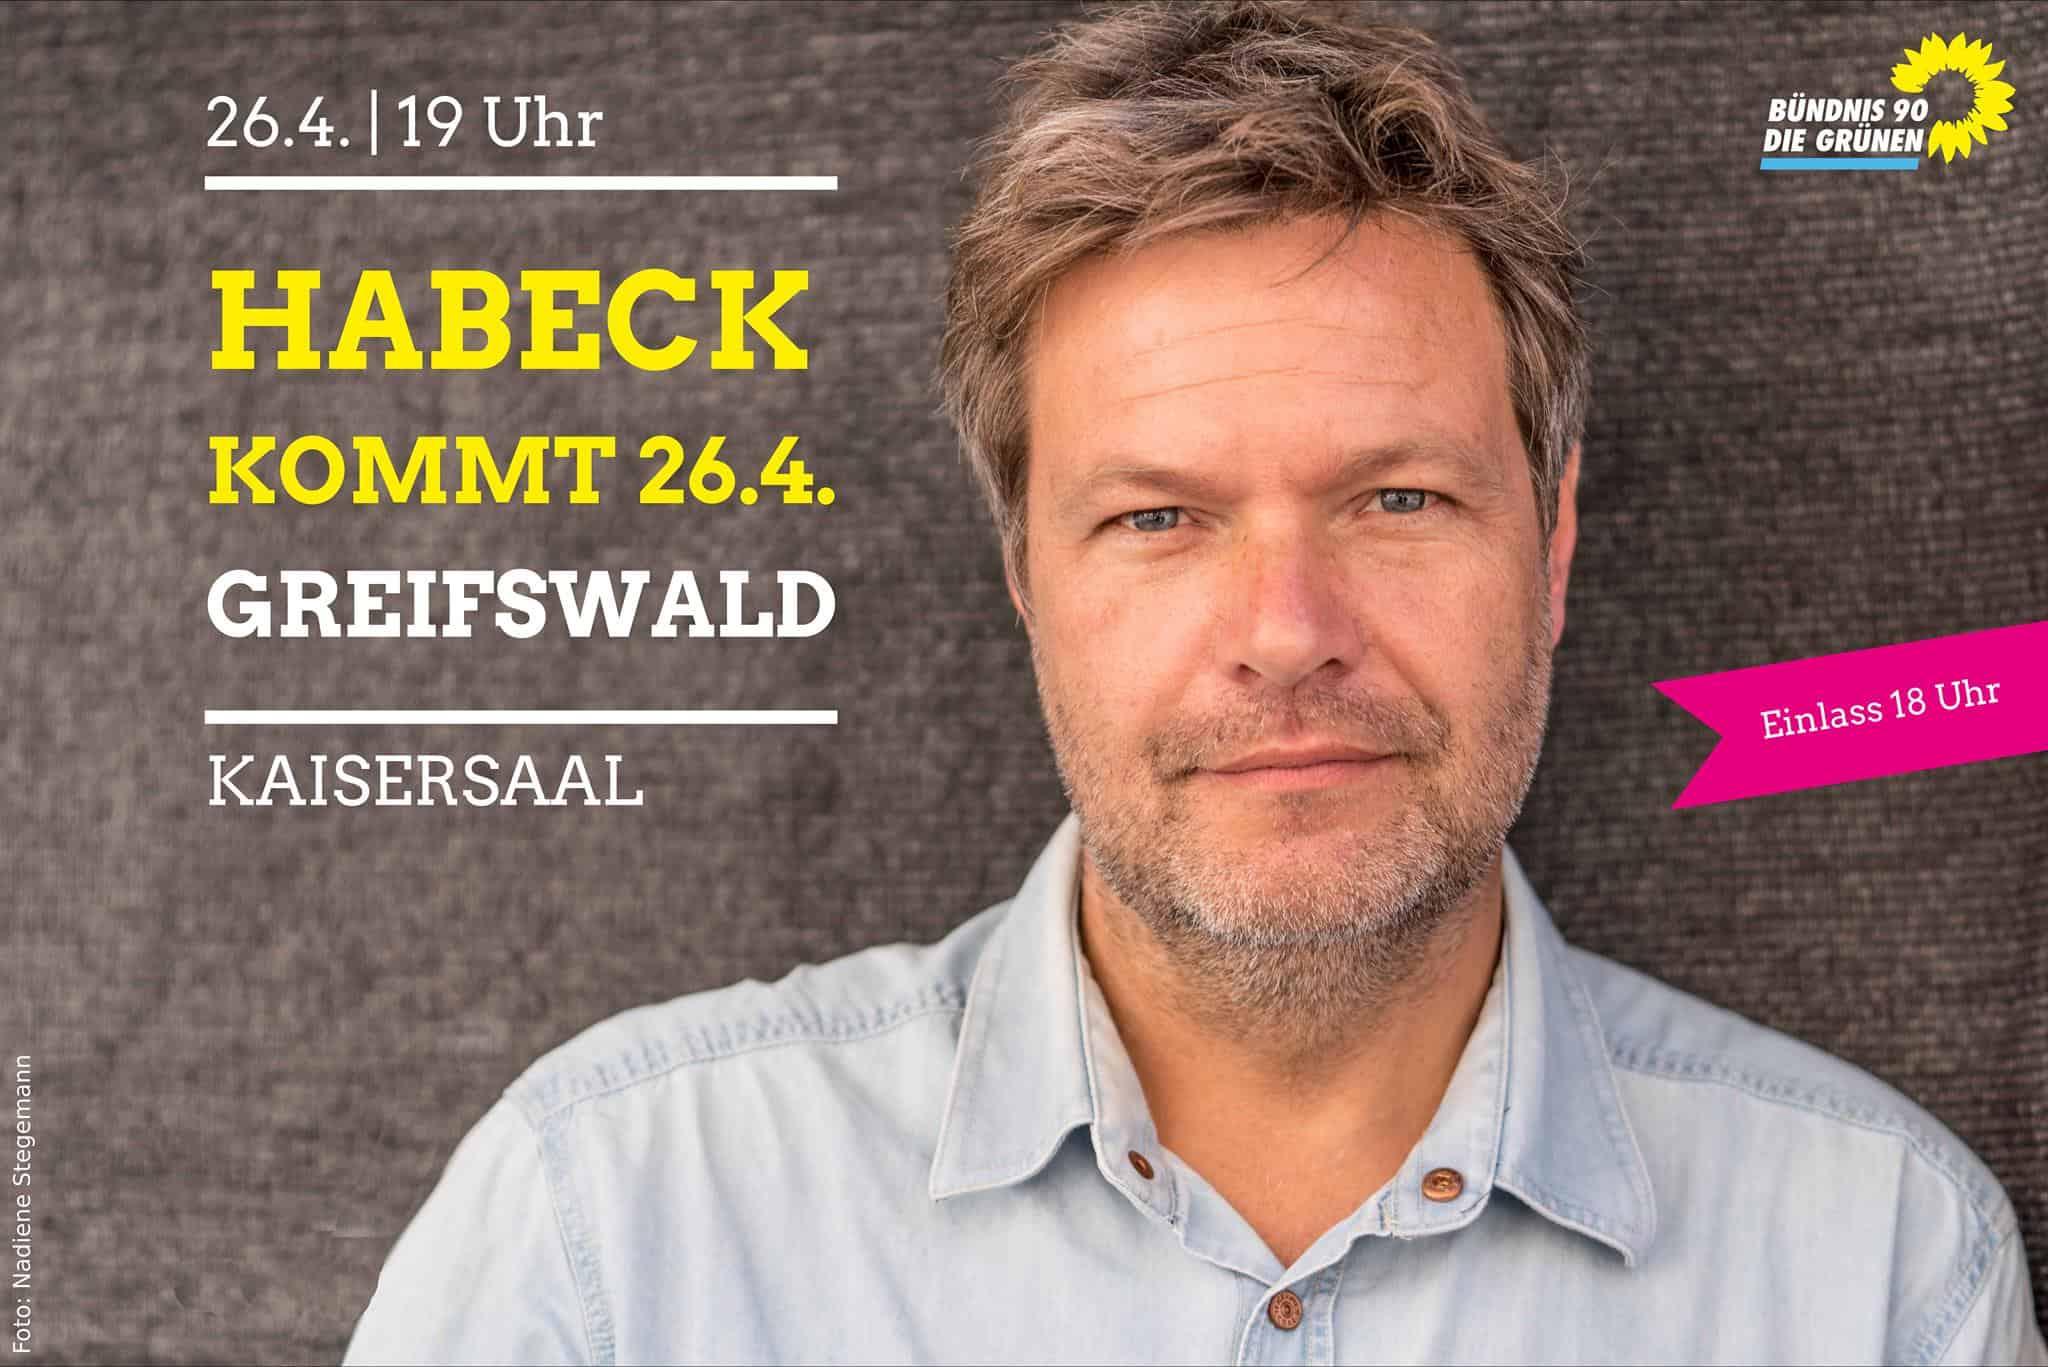 Robert Habeck in Greifswald